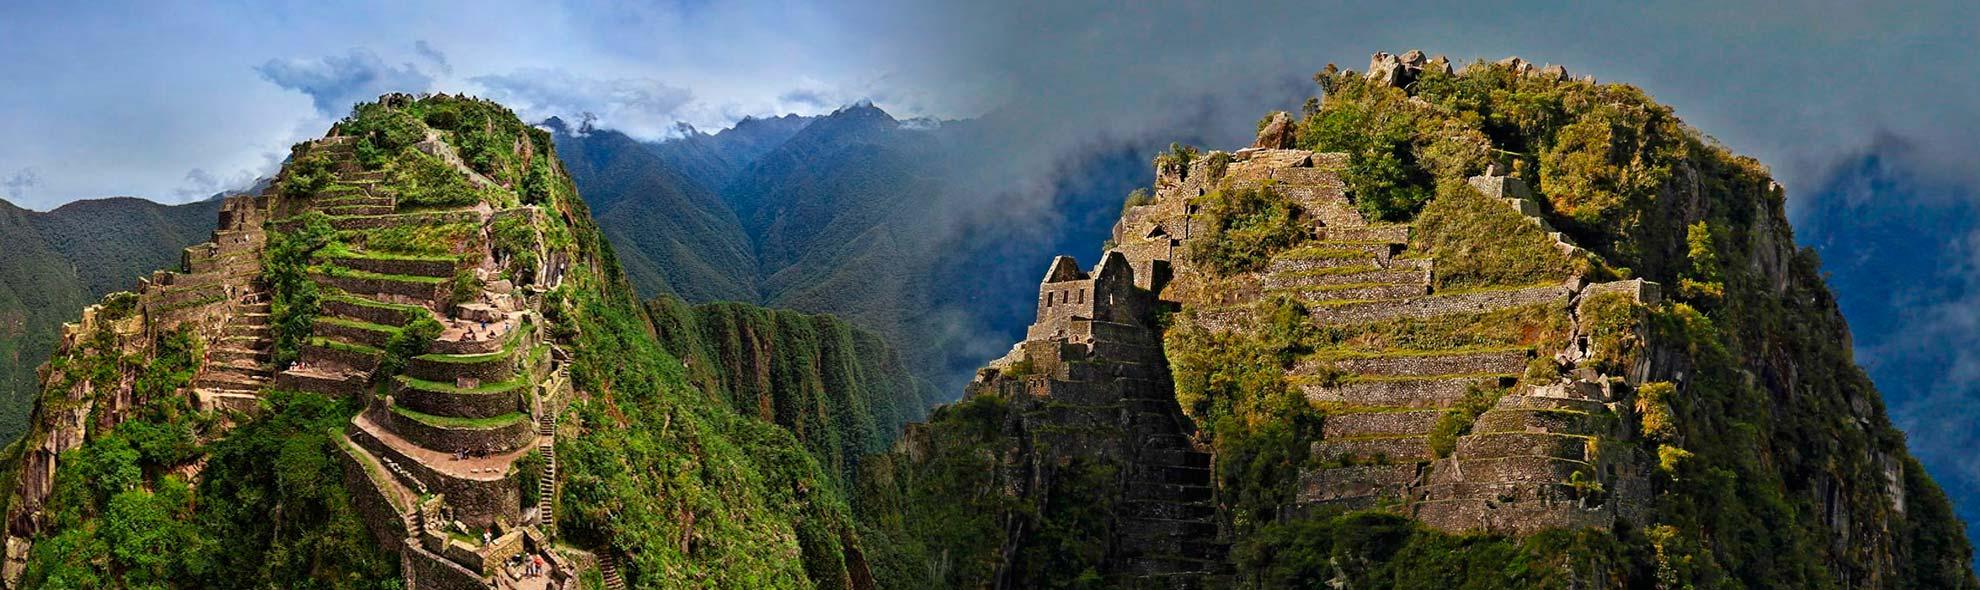 Huayna Picchu Permits 2020